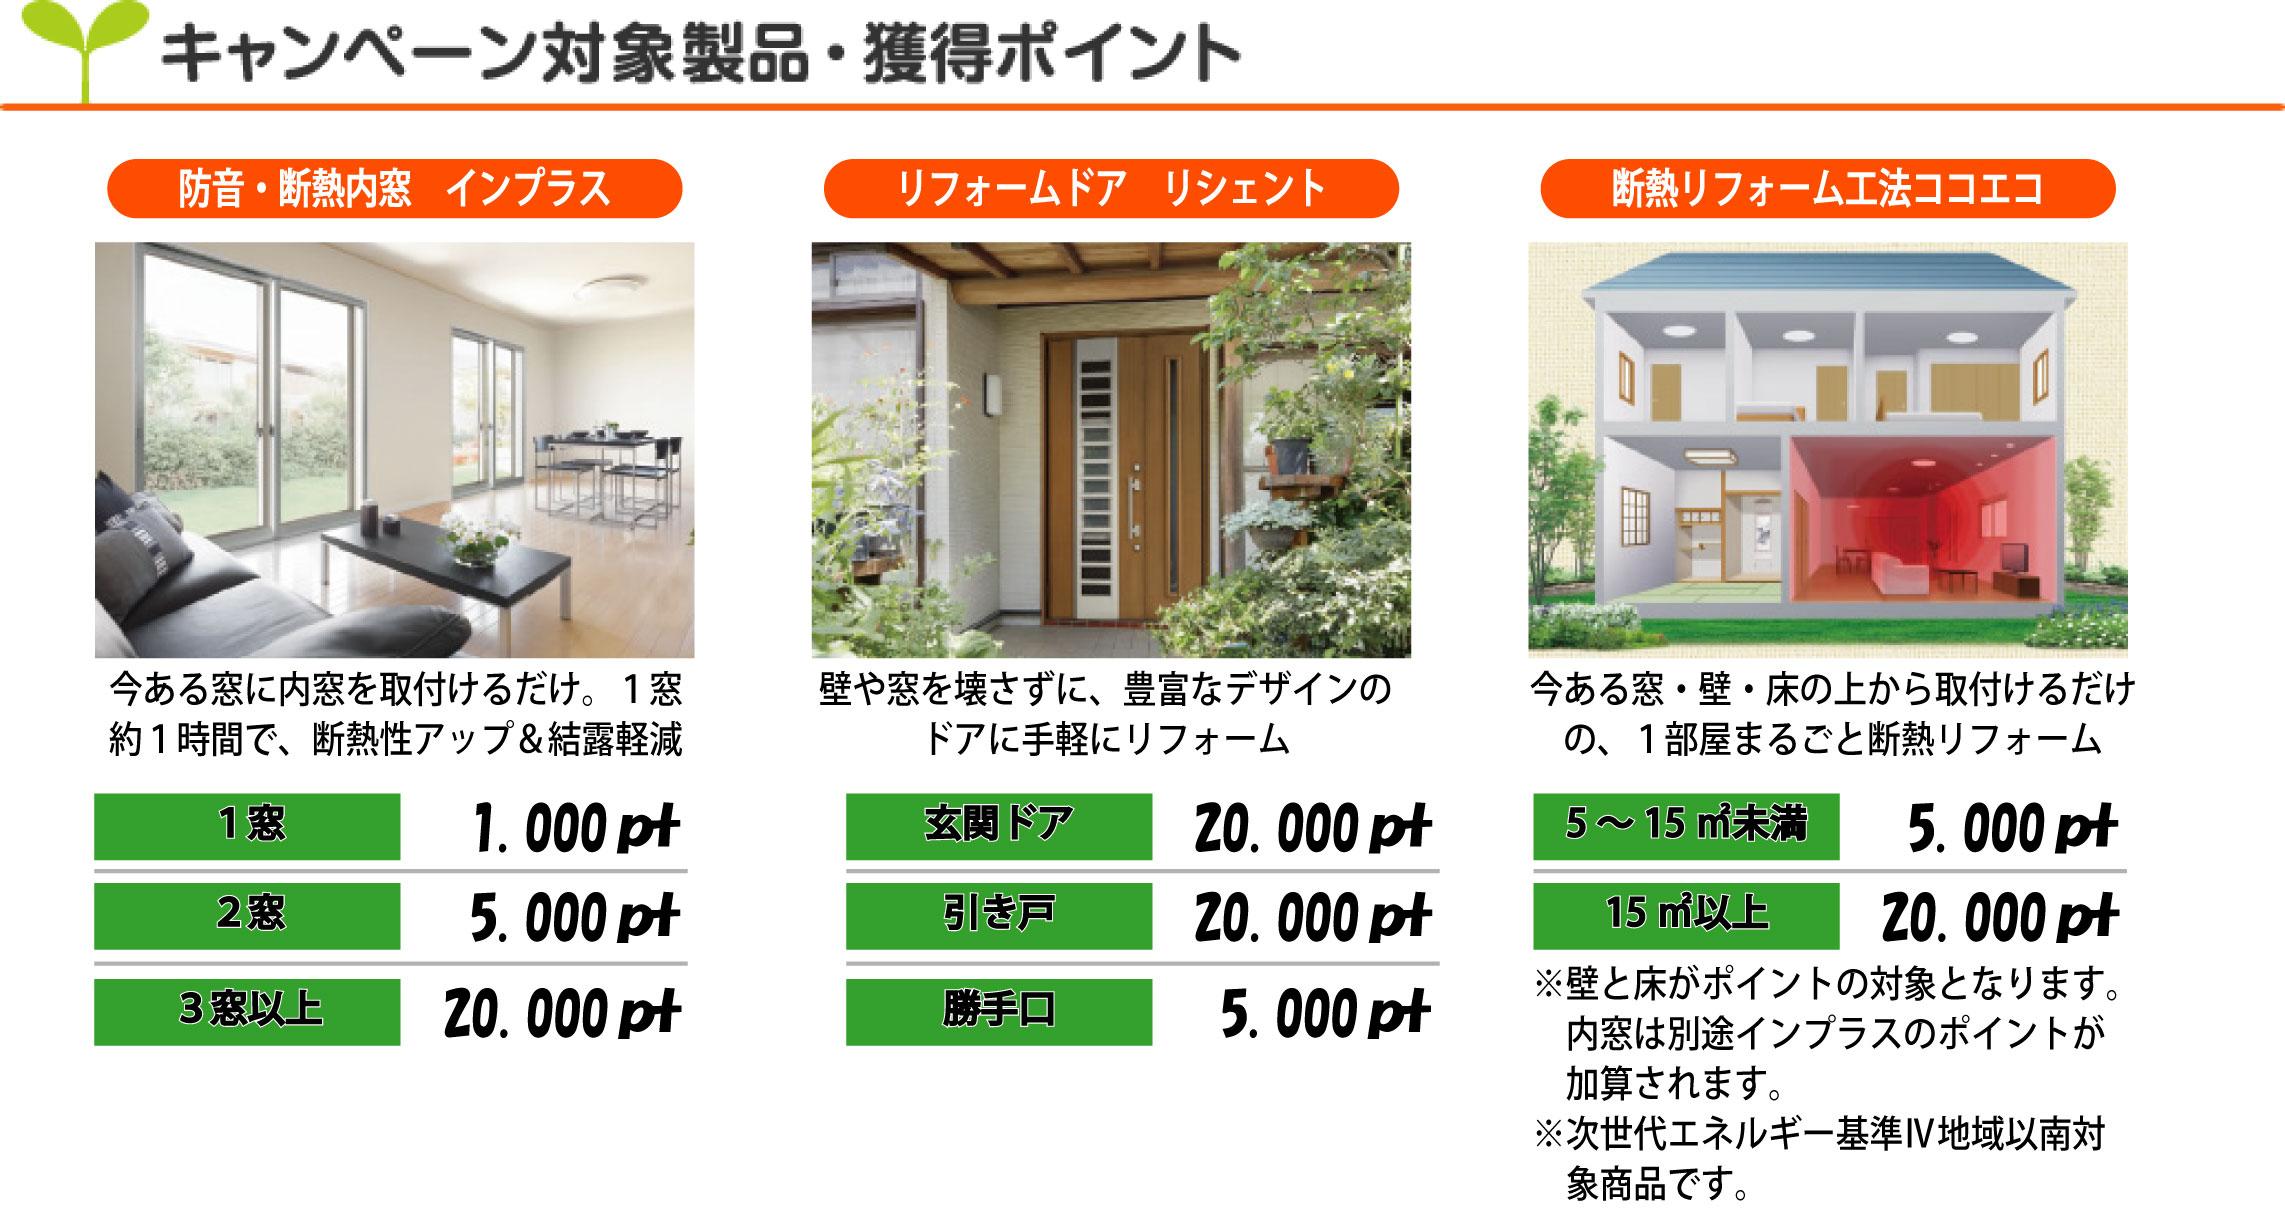 KuraSi-natu-sin67-12.jpg